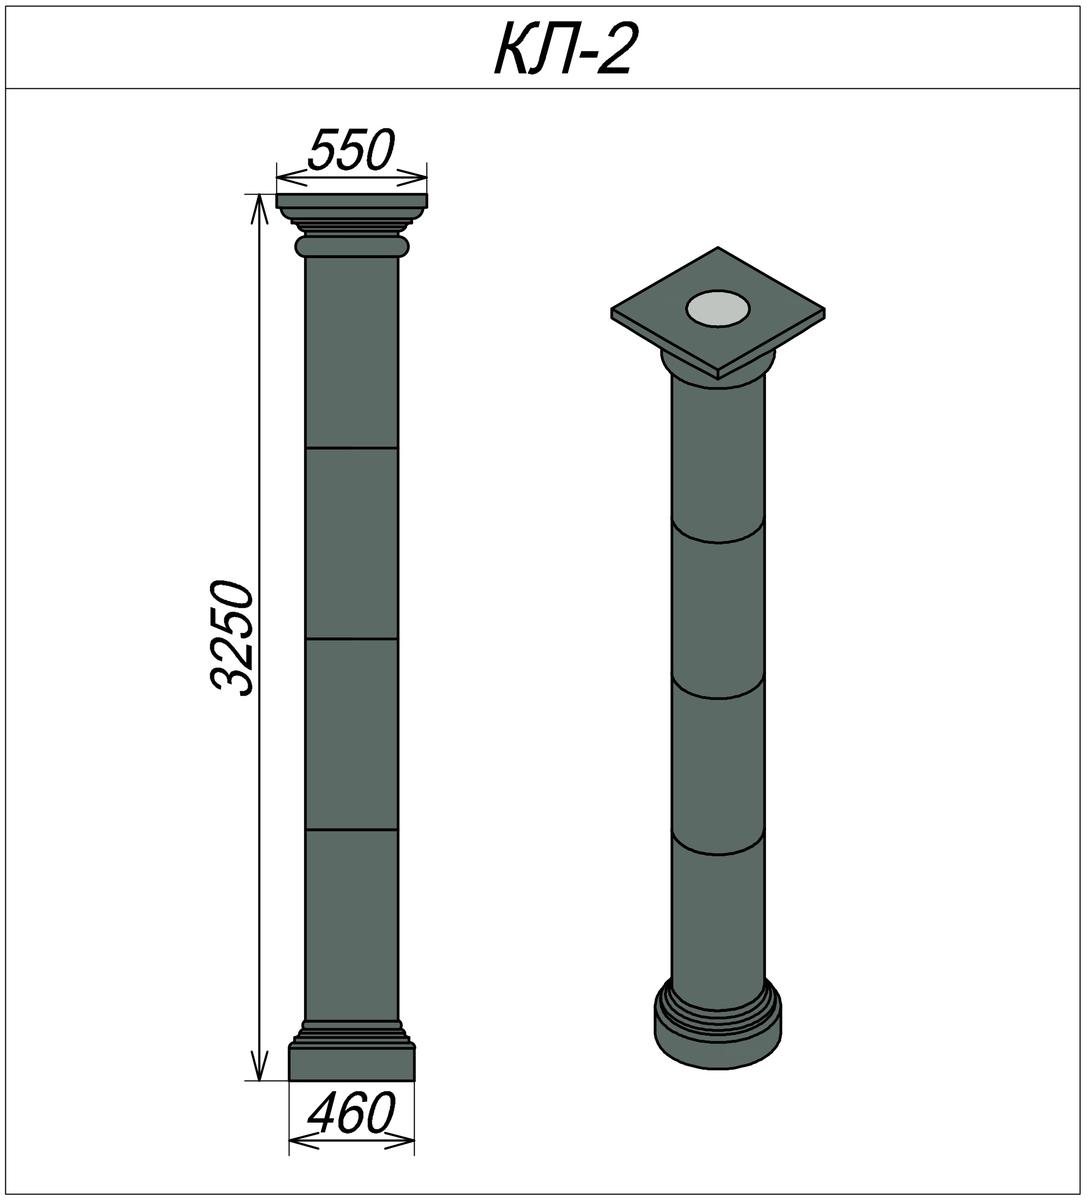 Декоративный элемент КЛ-2